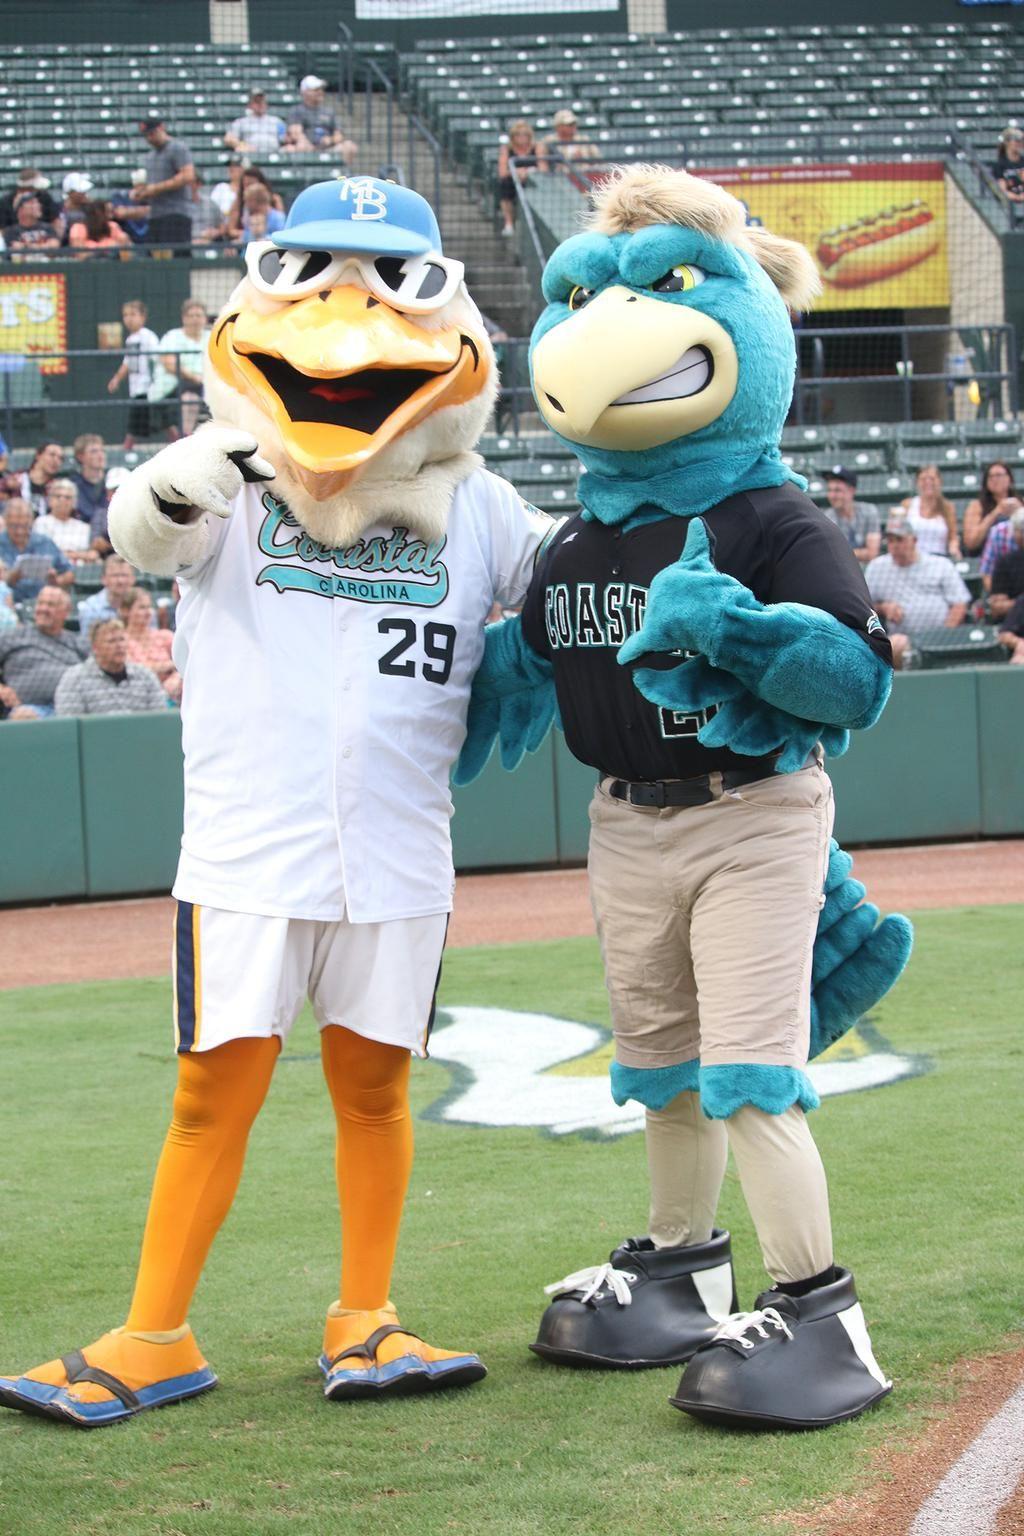 Myrtle Beach Pelicans On Twitter Myrtle Beach Mascot Pelican